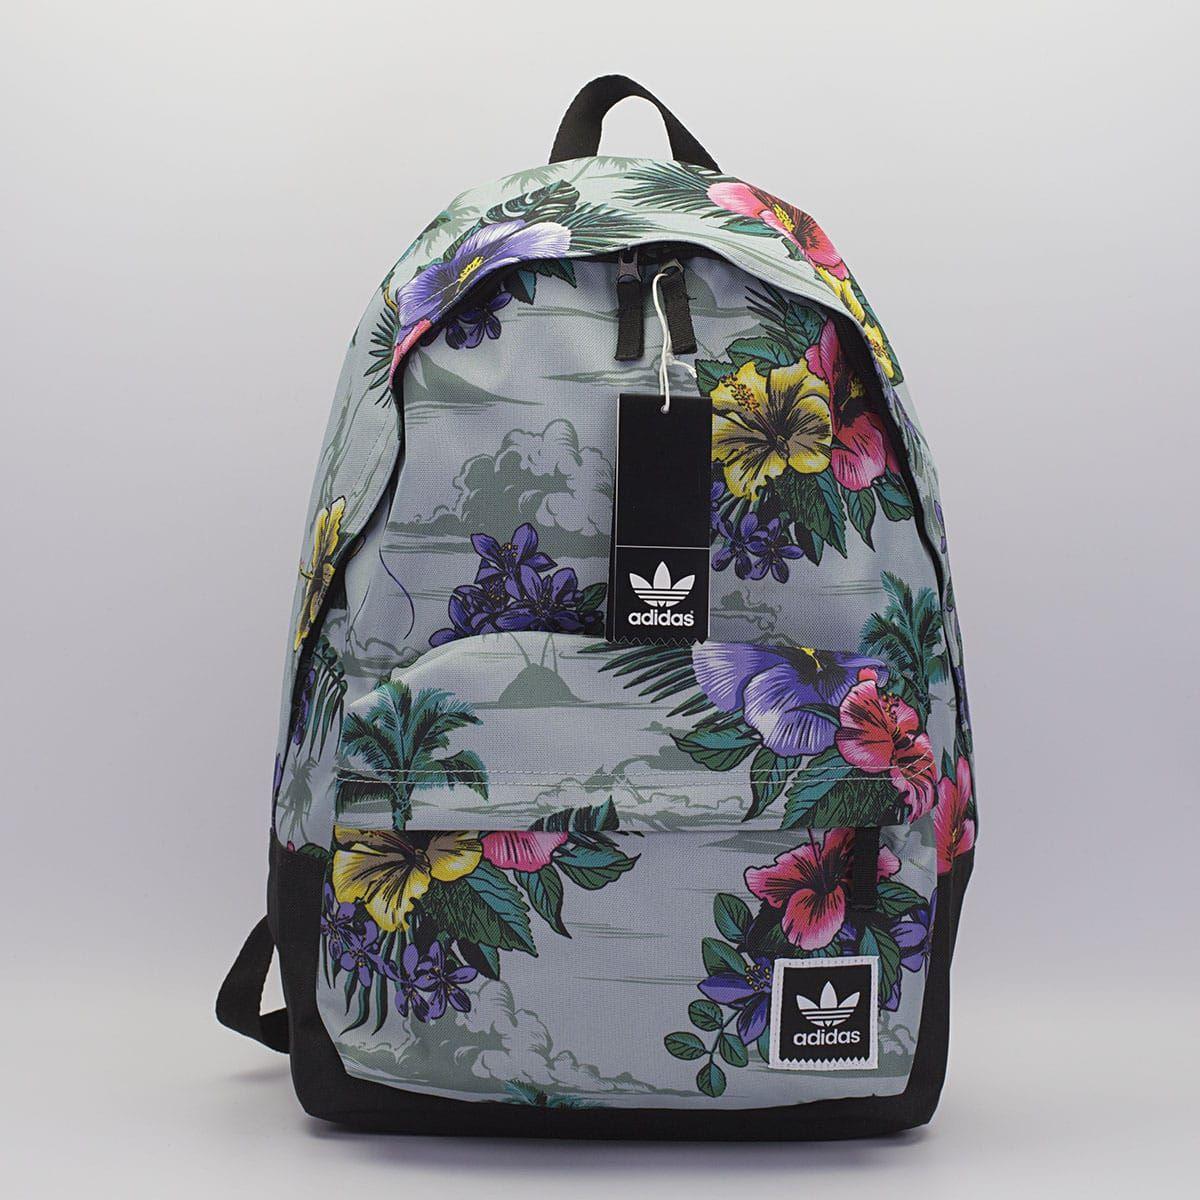 a76bf302ebc Adidas Island Backpack με πολύχρωμο print. #sneakerstown #adidas ...